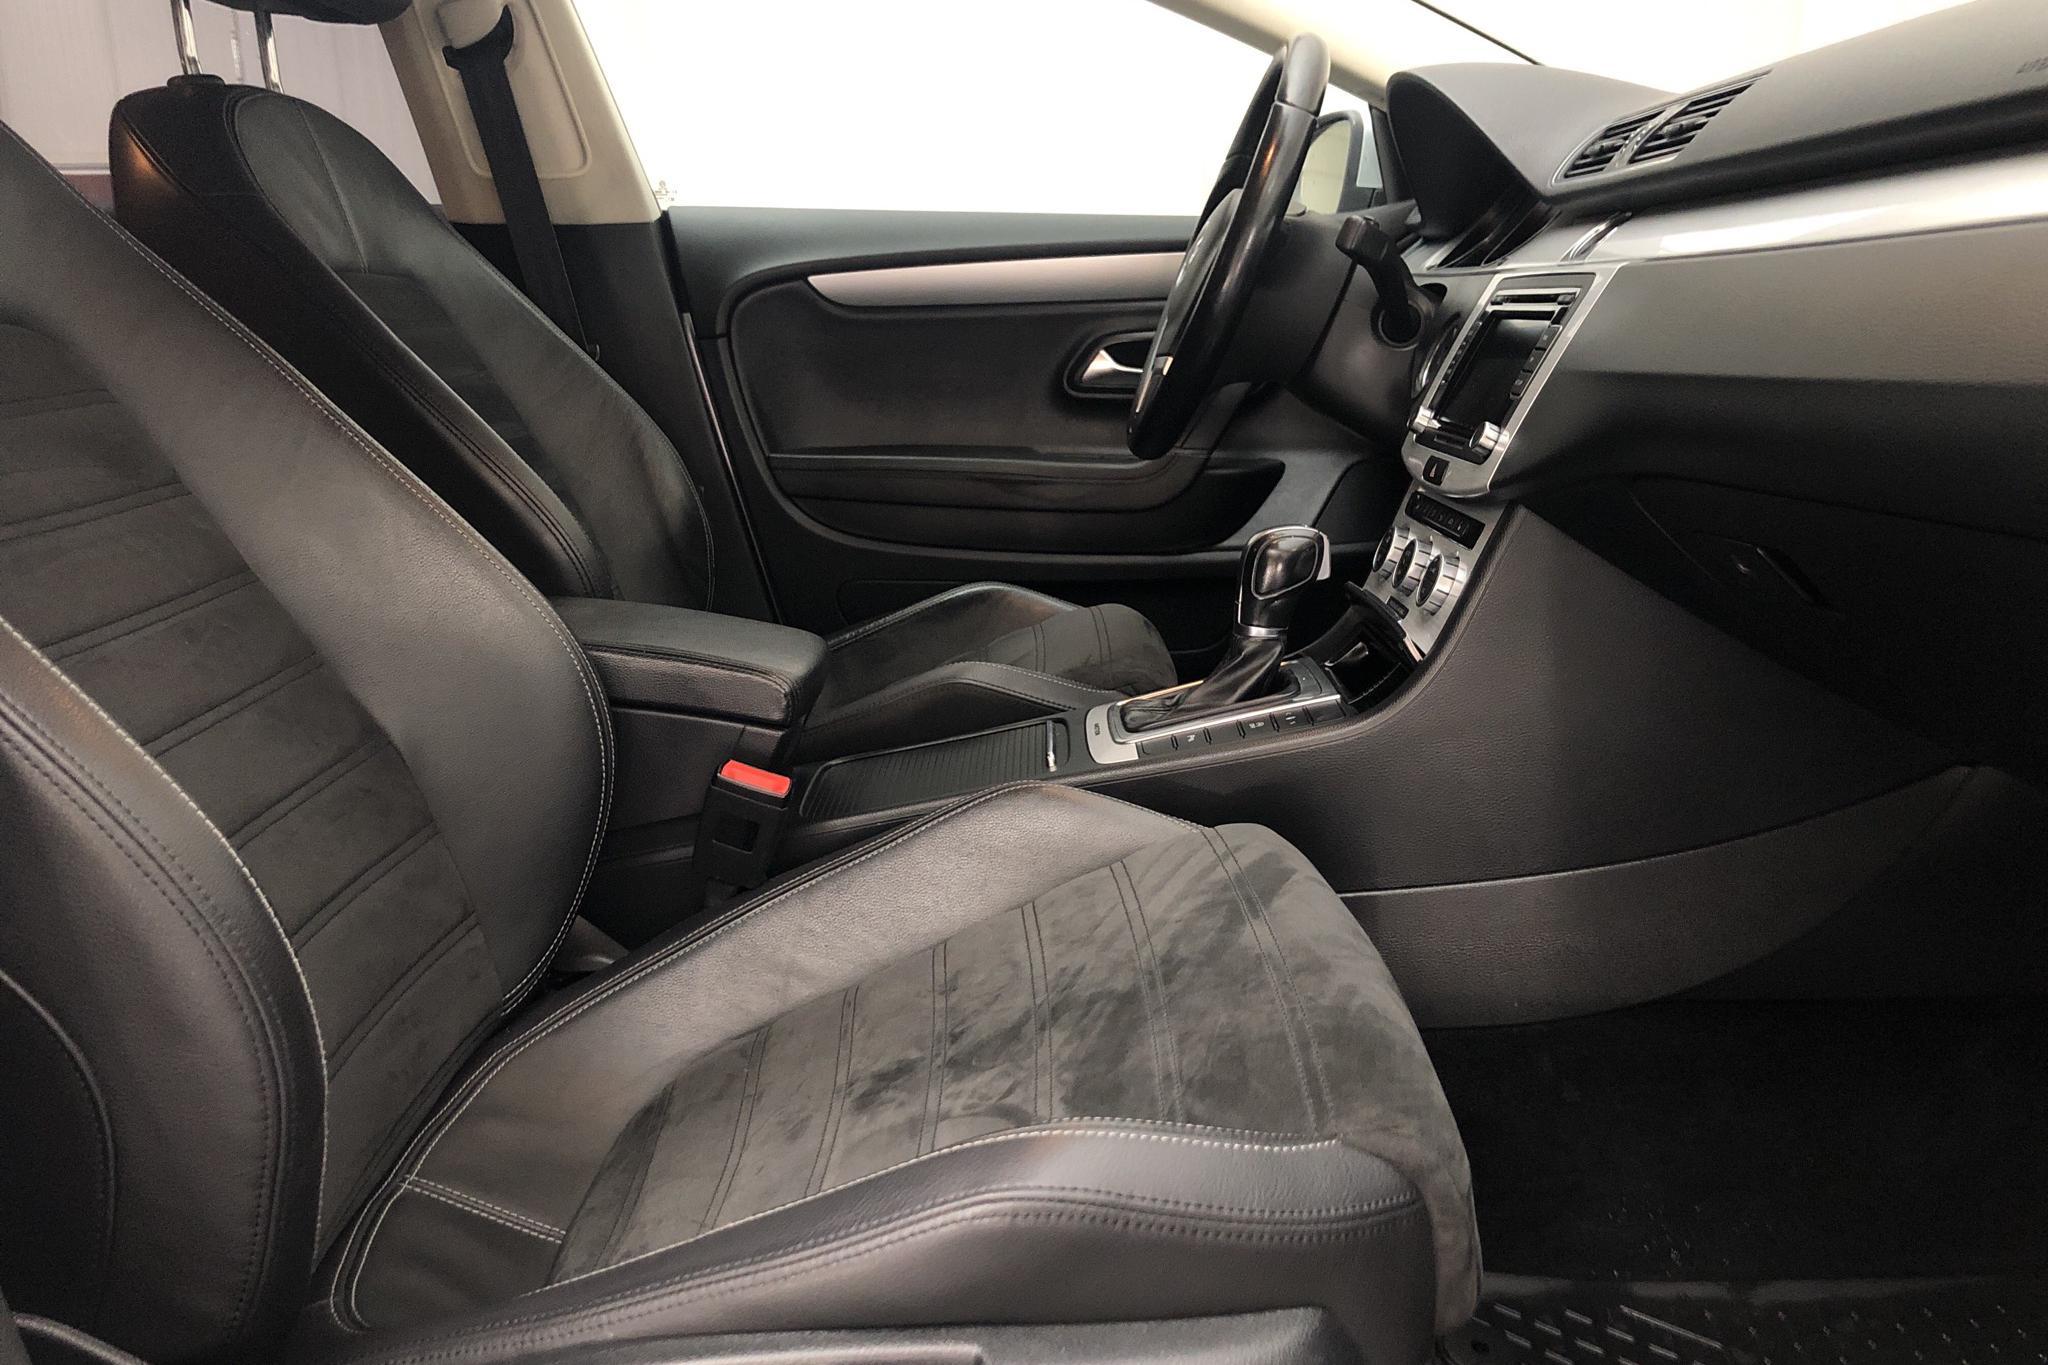 VW CC 2.0 TDI BlueMotion Technology 4Motion (170hk) - 16 190 mil - Automat - silver - 2013